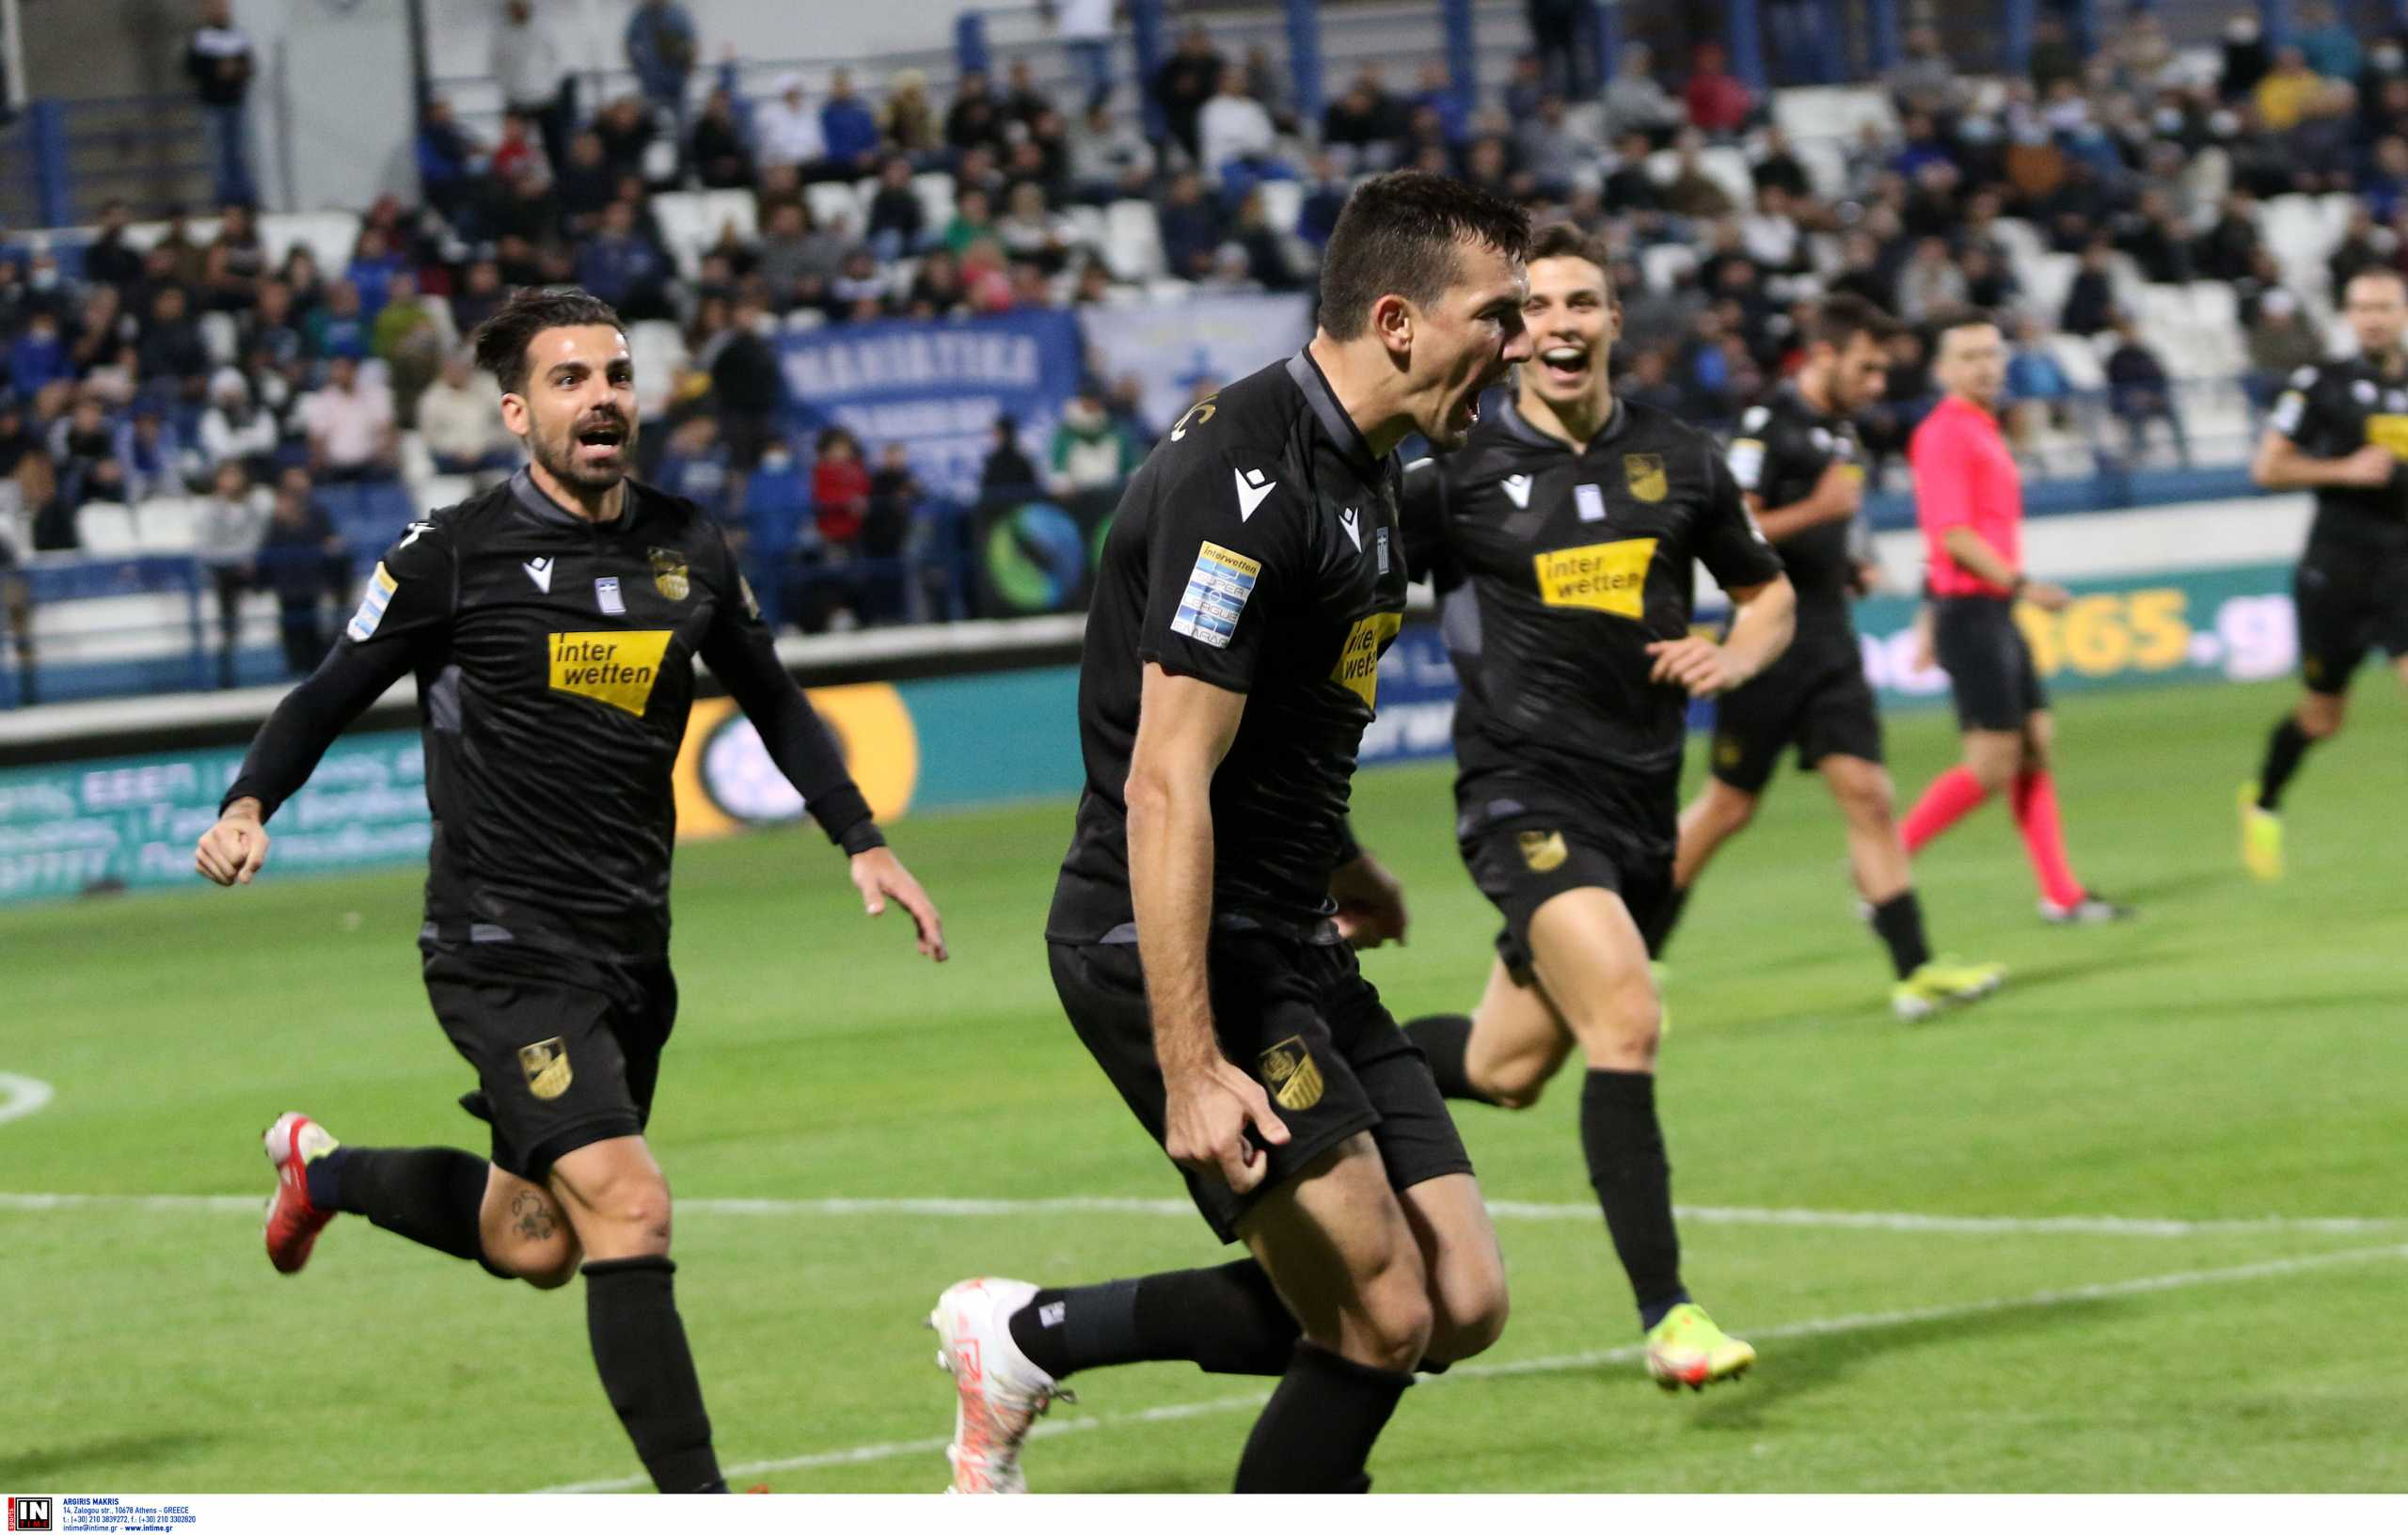 Superleague, Ιωνικός – Λαμία 1-2: Πρώτη νίκη για τους Φθιώτες – Έχασαν Τσιγκρίνσκι και Ντάλσιο οι Νικαιώτες